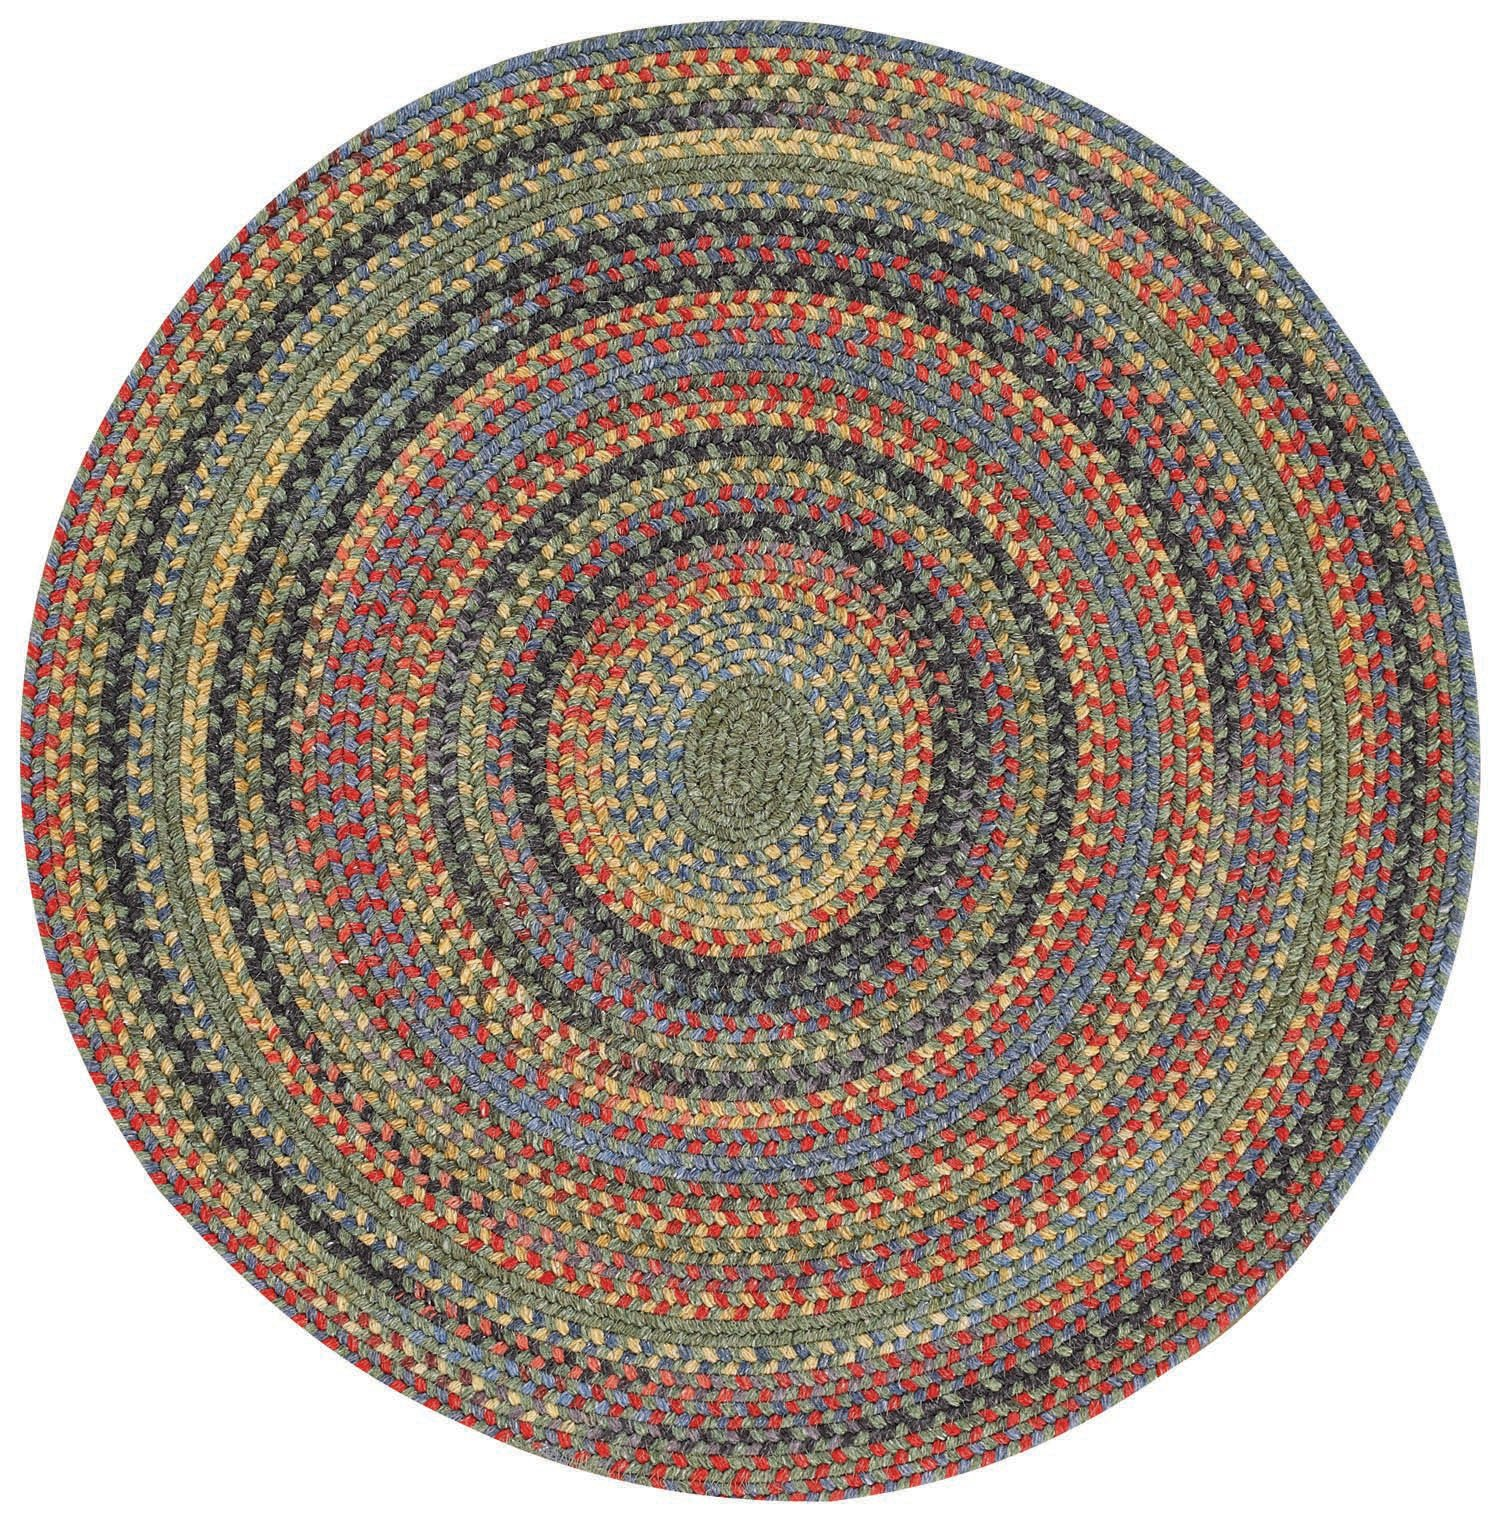 Used Oval Braided Rugs: Round Braided Rug: Amazon.com